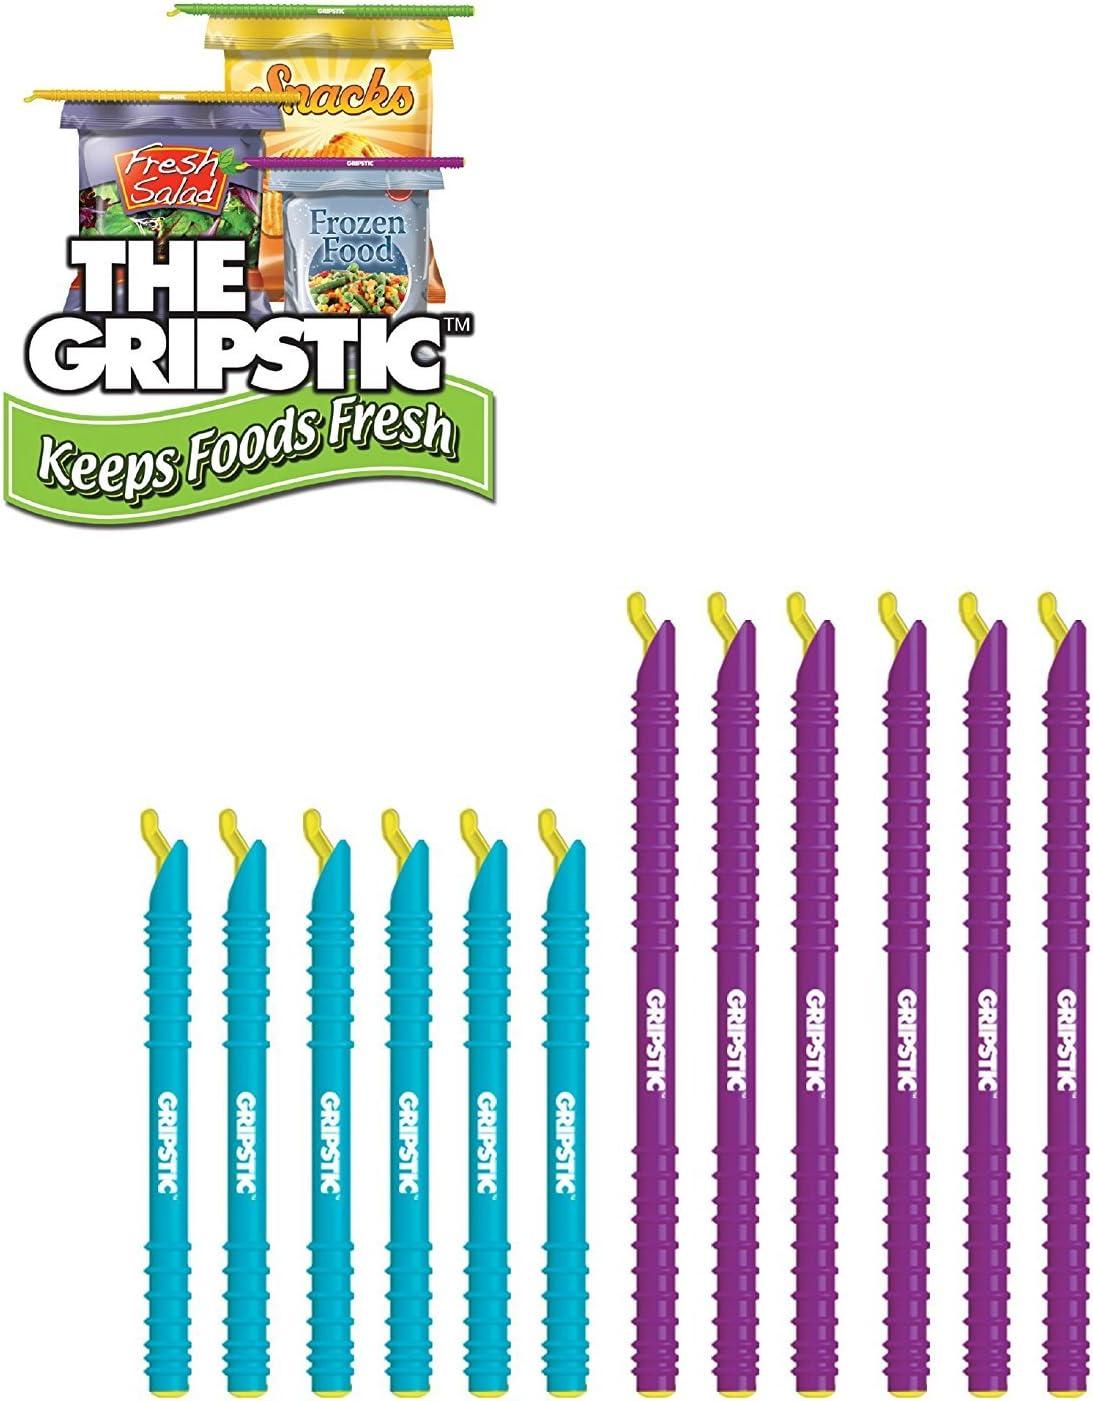 GRIPSTIC/® 12PK Small